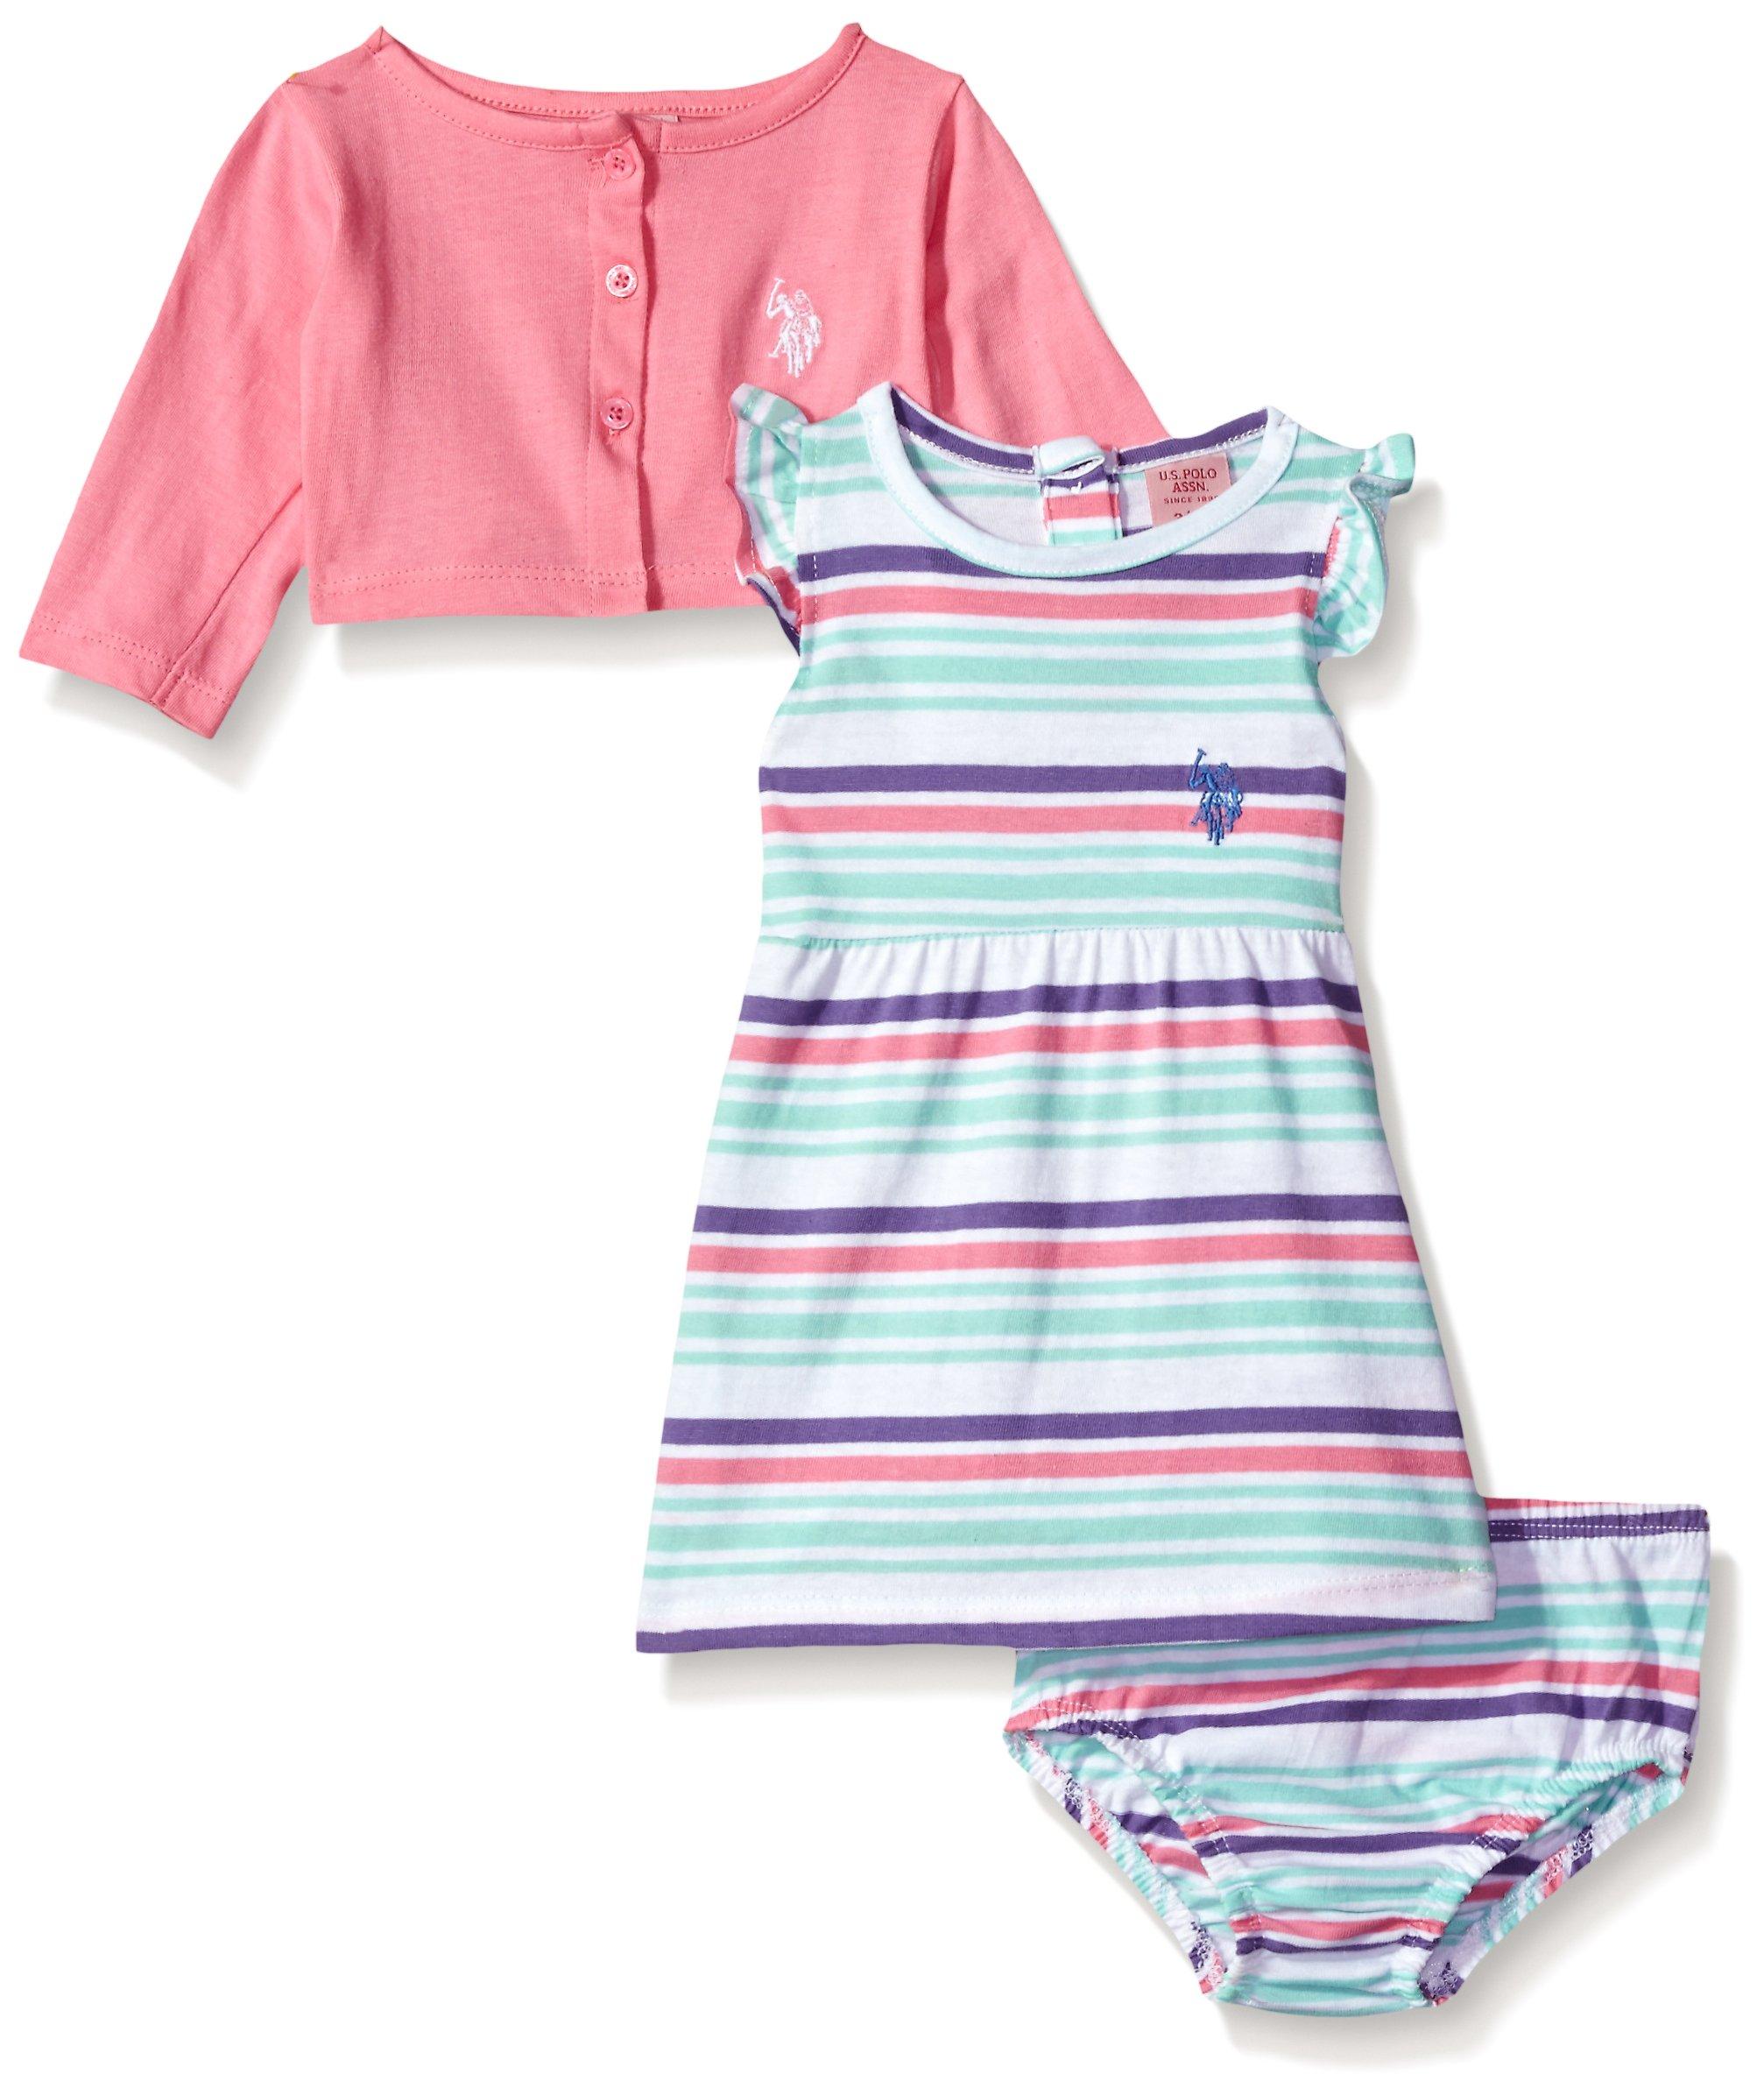 U S Polo Assn Baby Girls Dress with Sweater Jacket Short